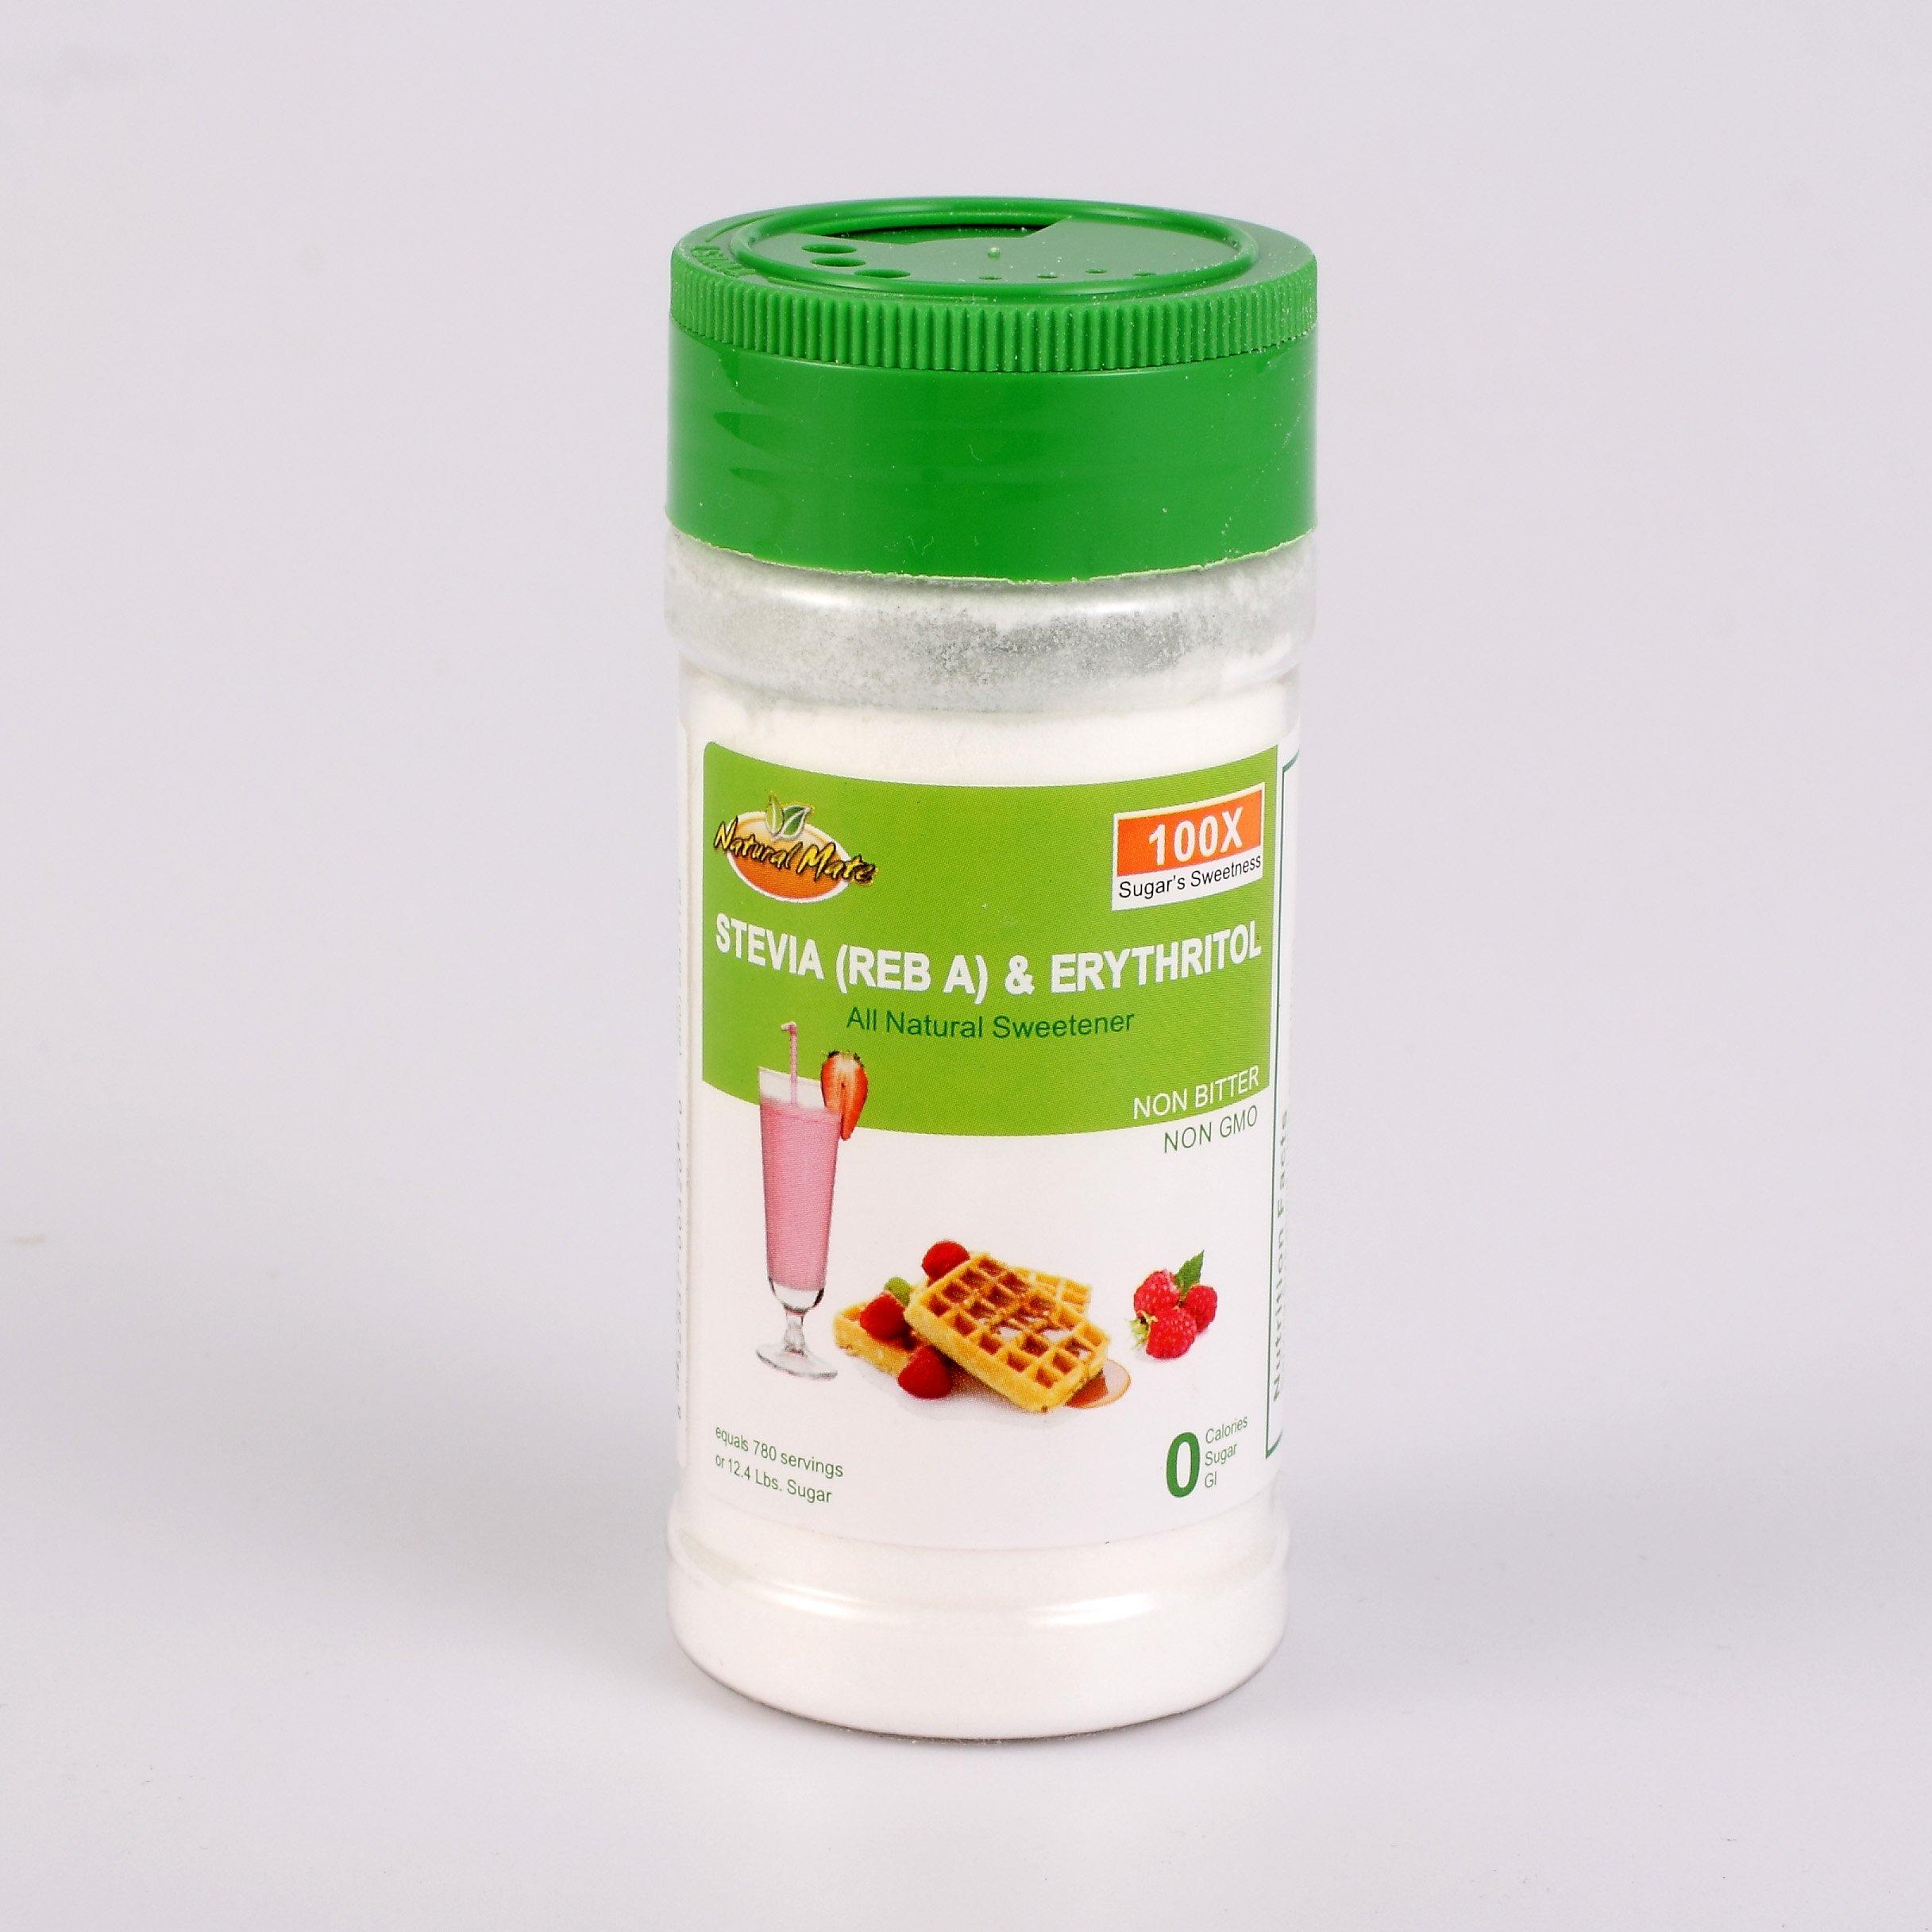 Natural Mate Non-bittered Stevia & Erythritol (2oz - Sweetener 780 Servings/Bottle) - 100x Sugar's Sweetness